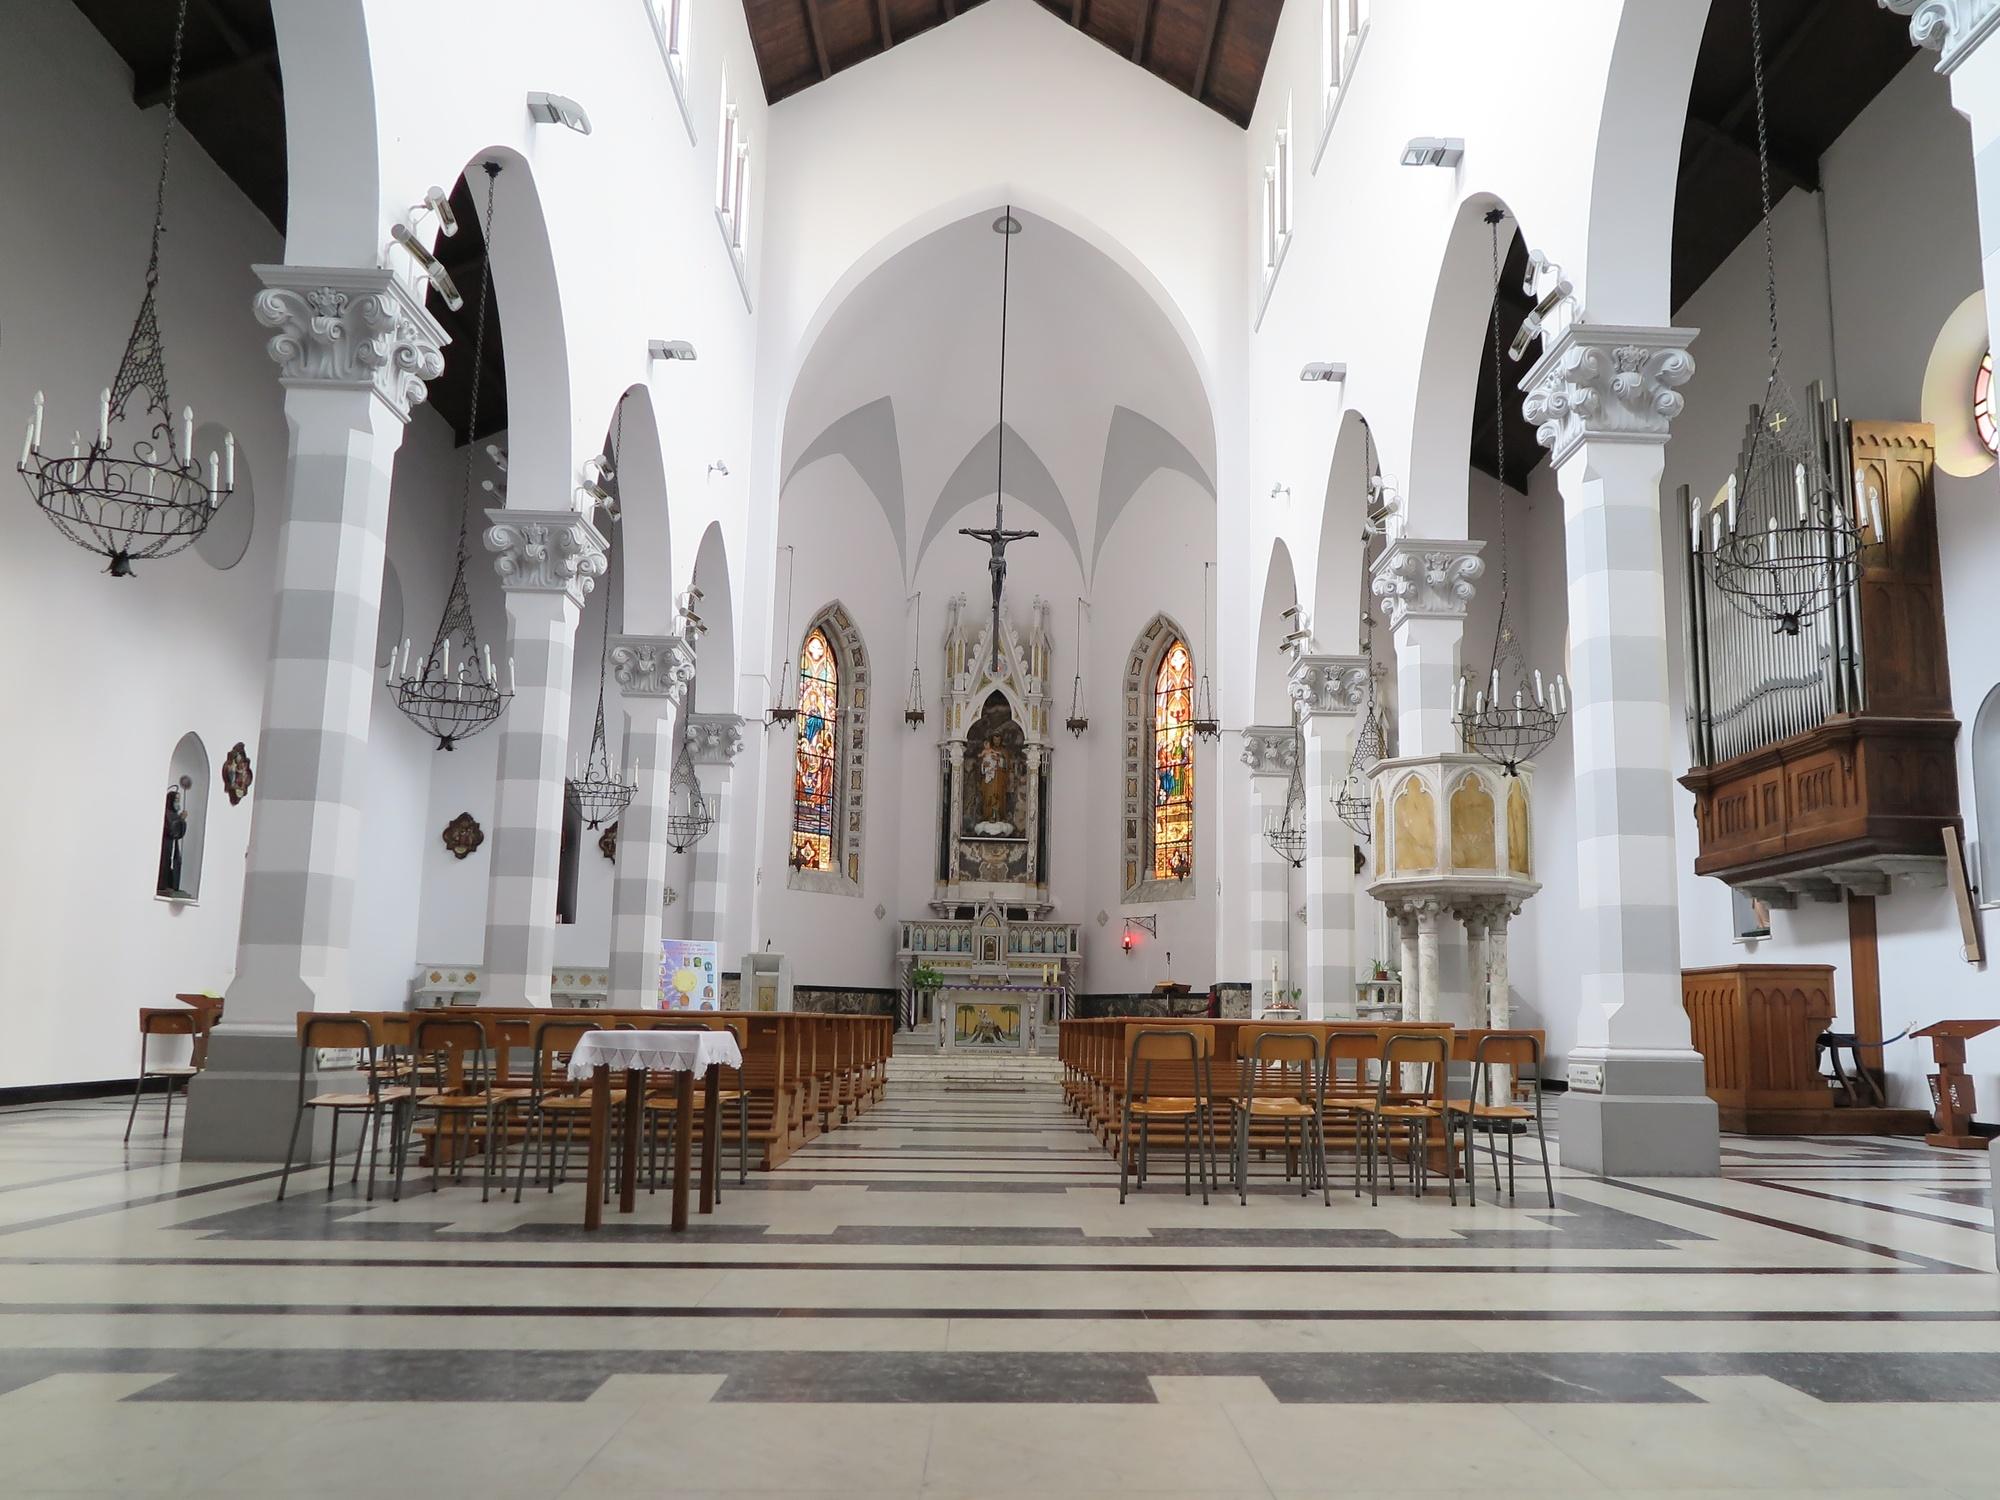 chiesa-2016-03-11-08-02-07_0